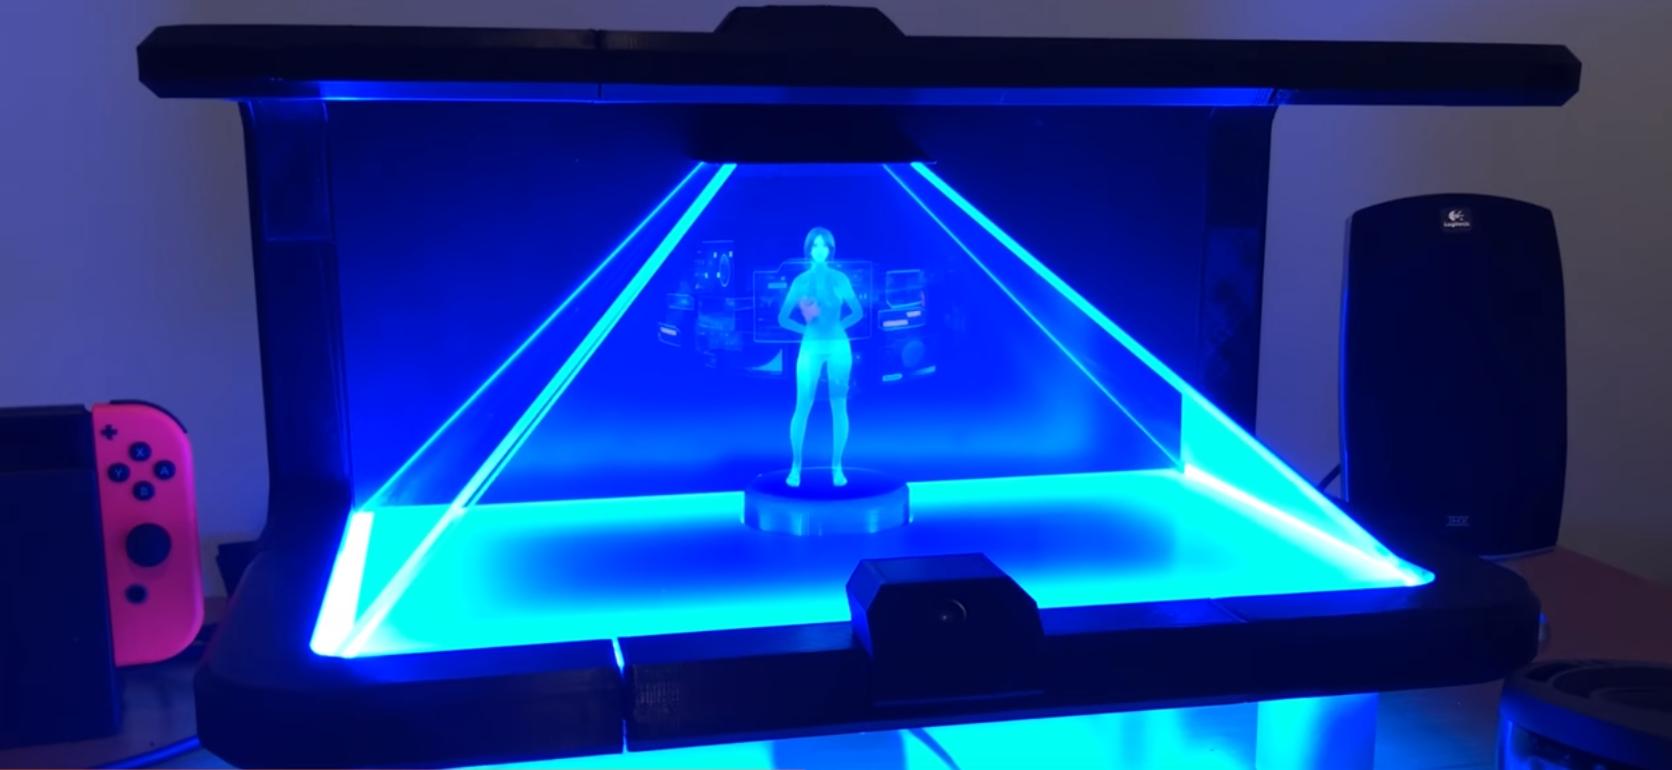 Holographic Cortana Uses Bing, Windows To Retrieve Data